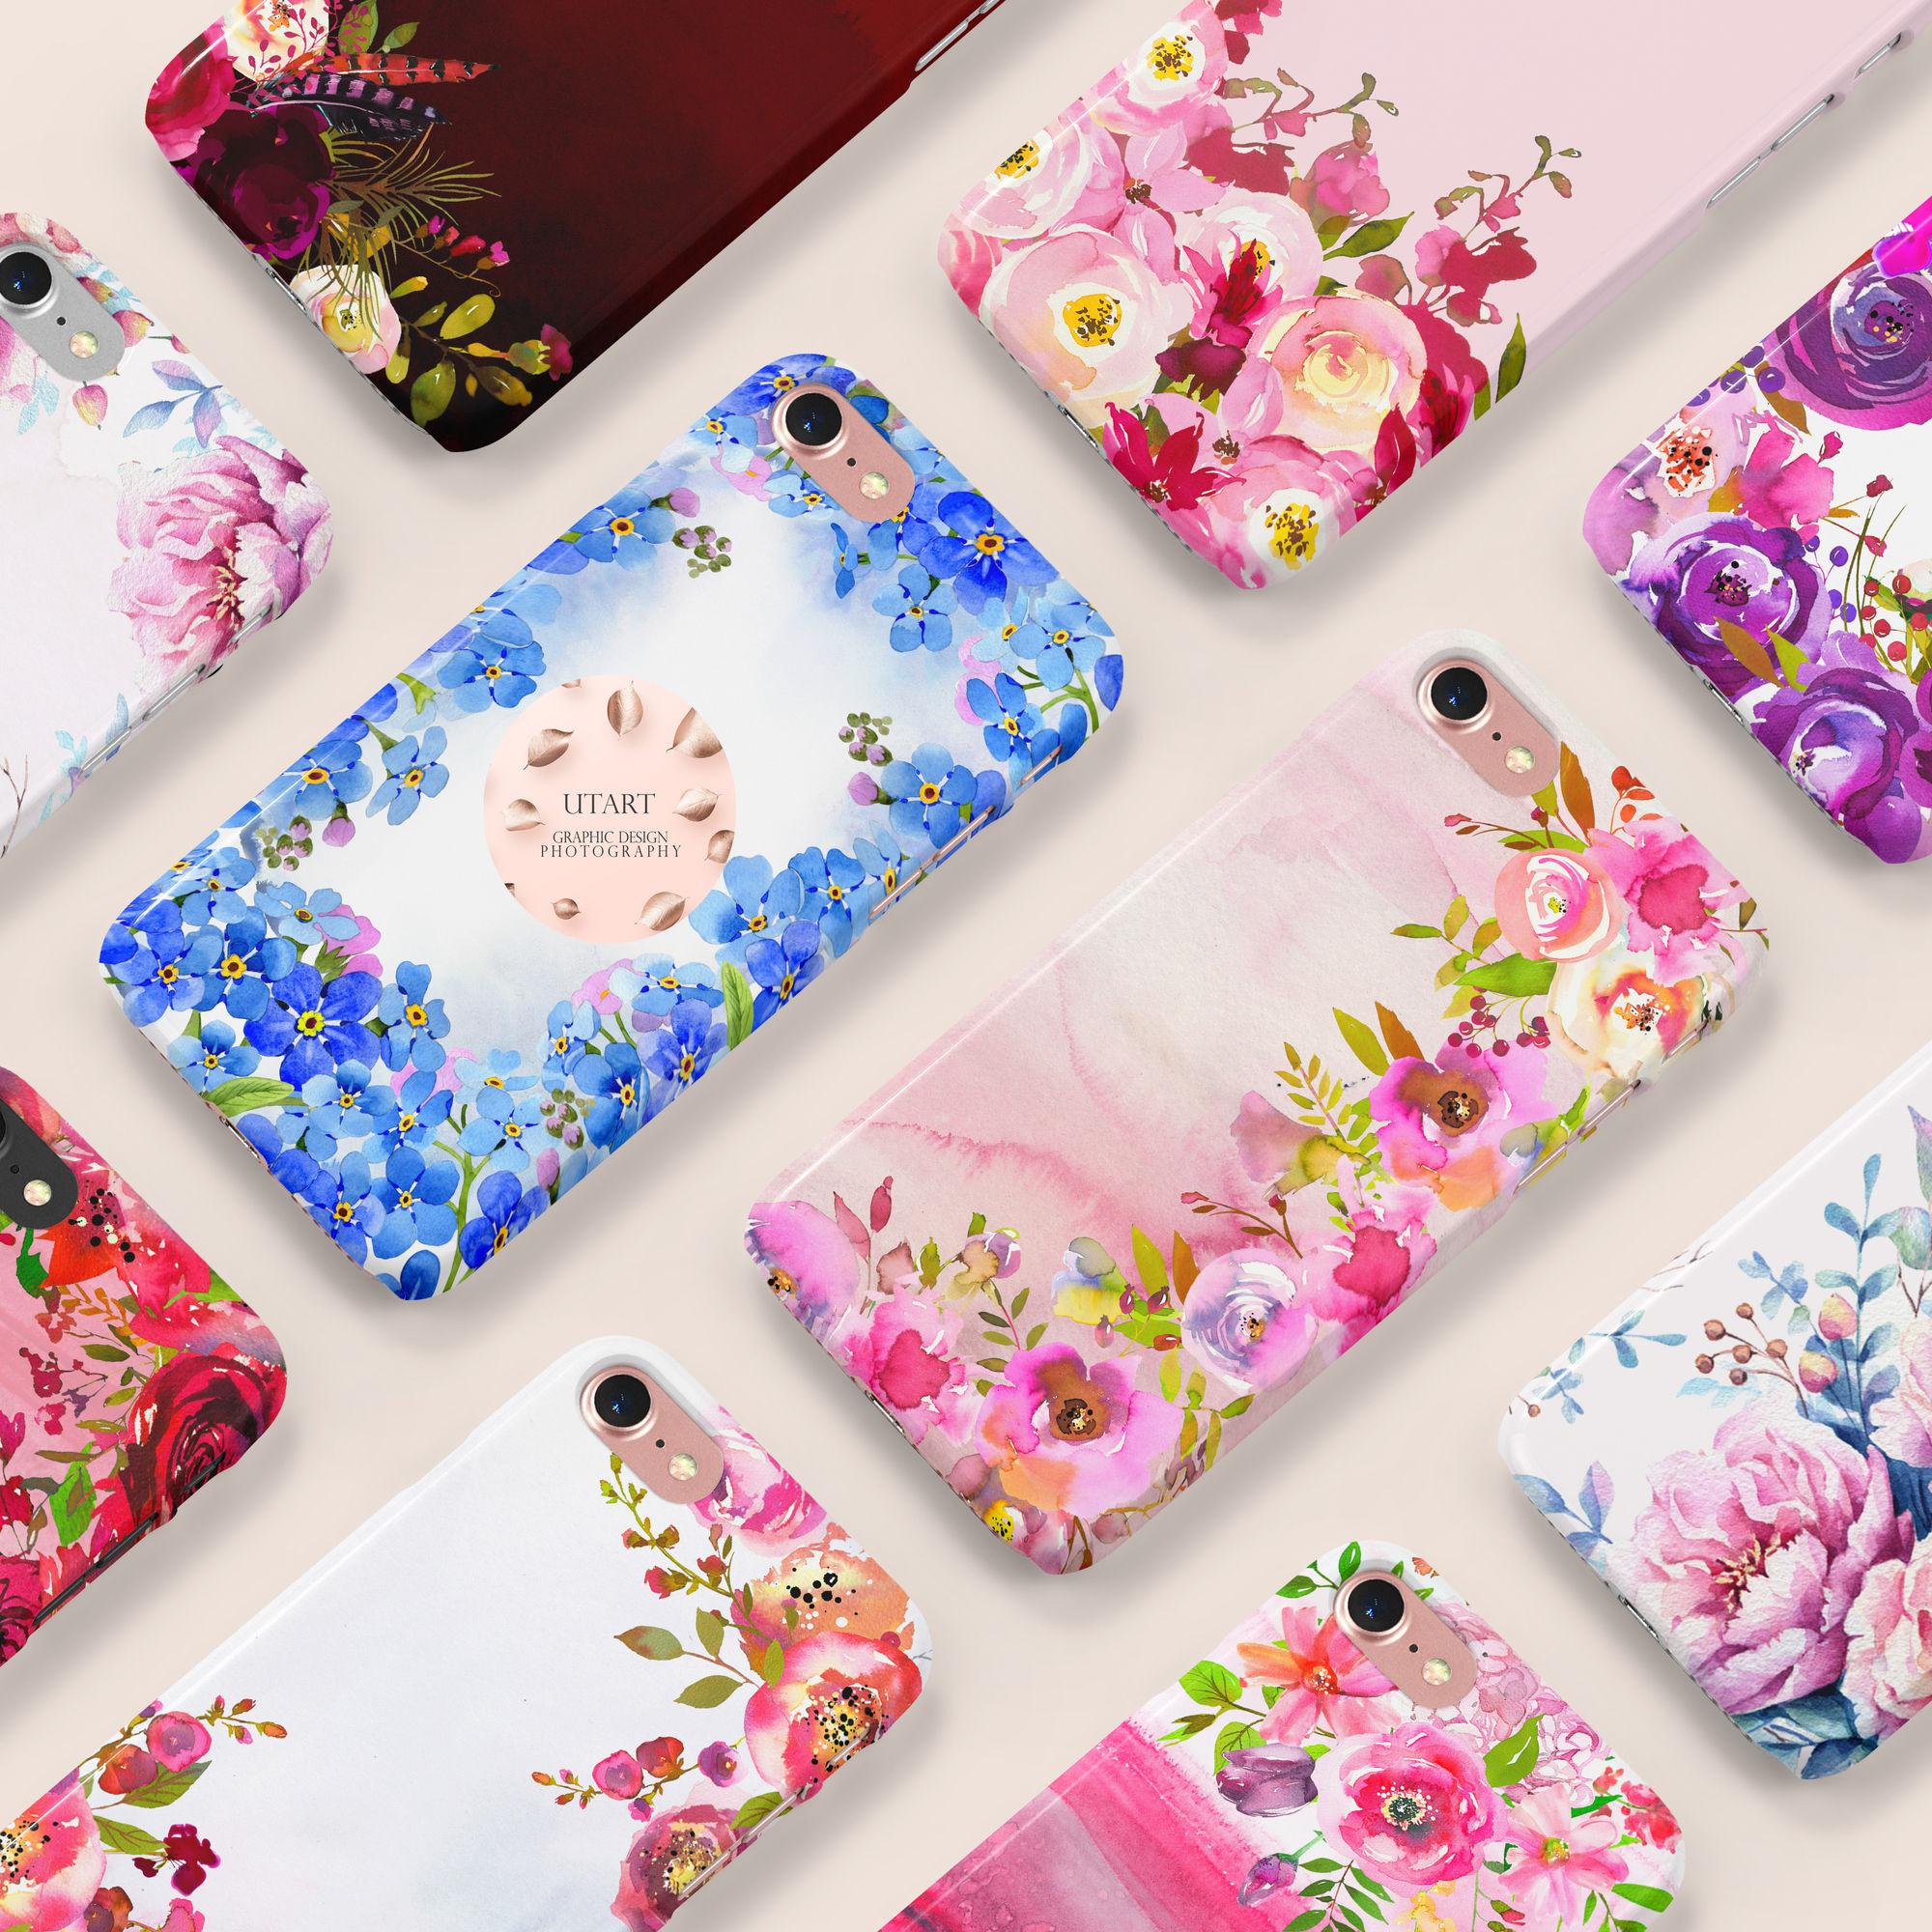 UTART Flower Watercolor Phone Cases